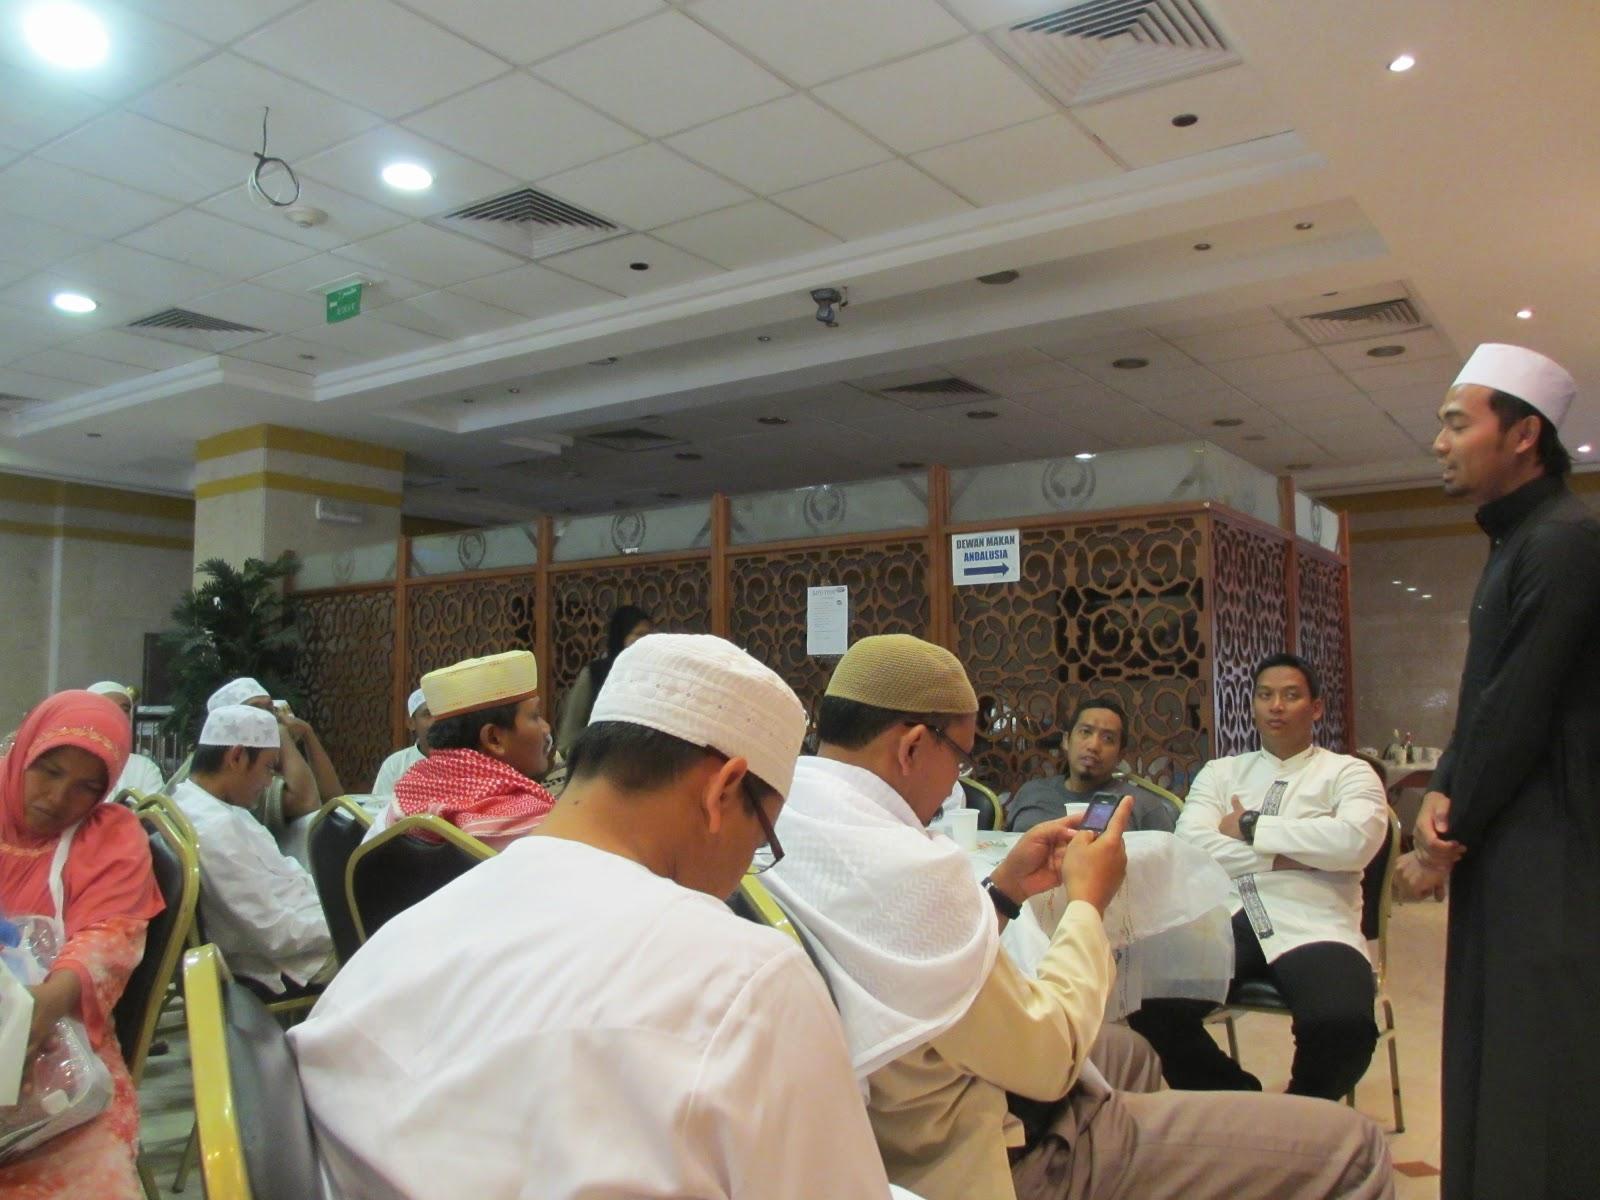 Harga Umroh Desember 2014 Surabaya Aman Nyaman dan Terpercaya